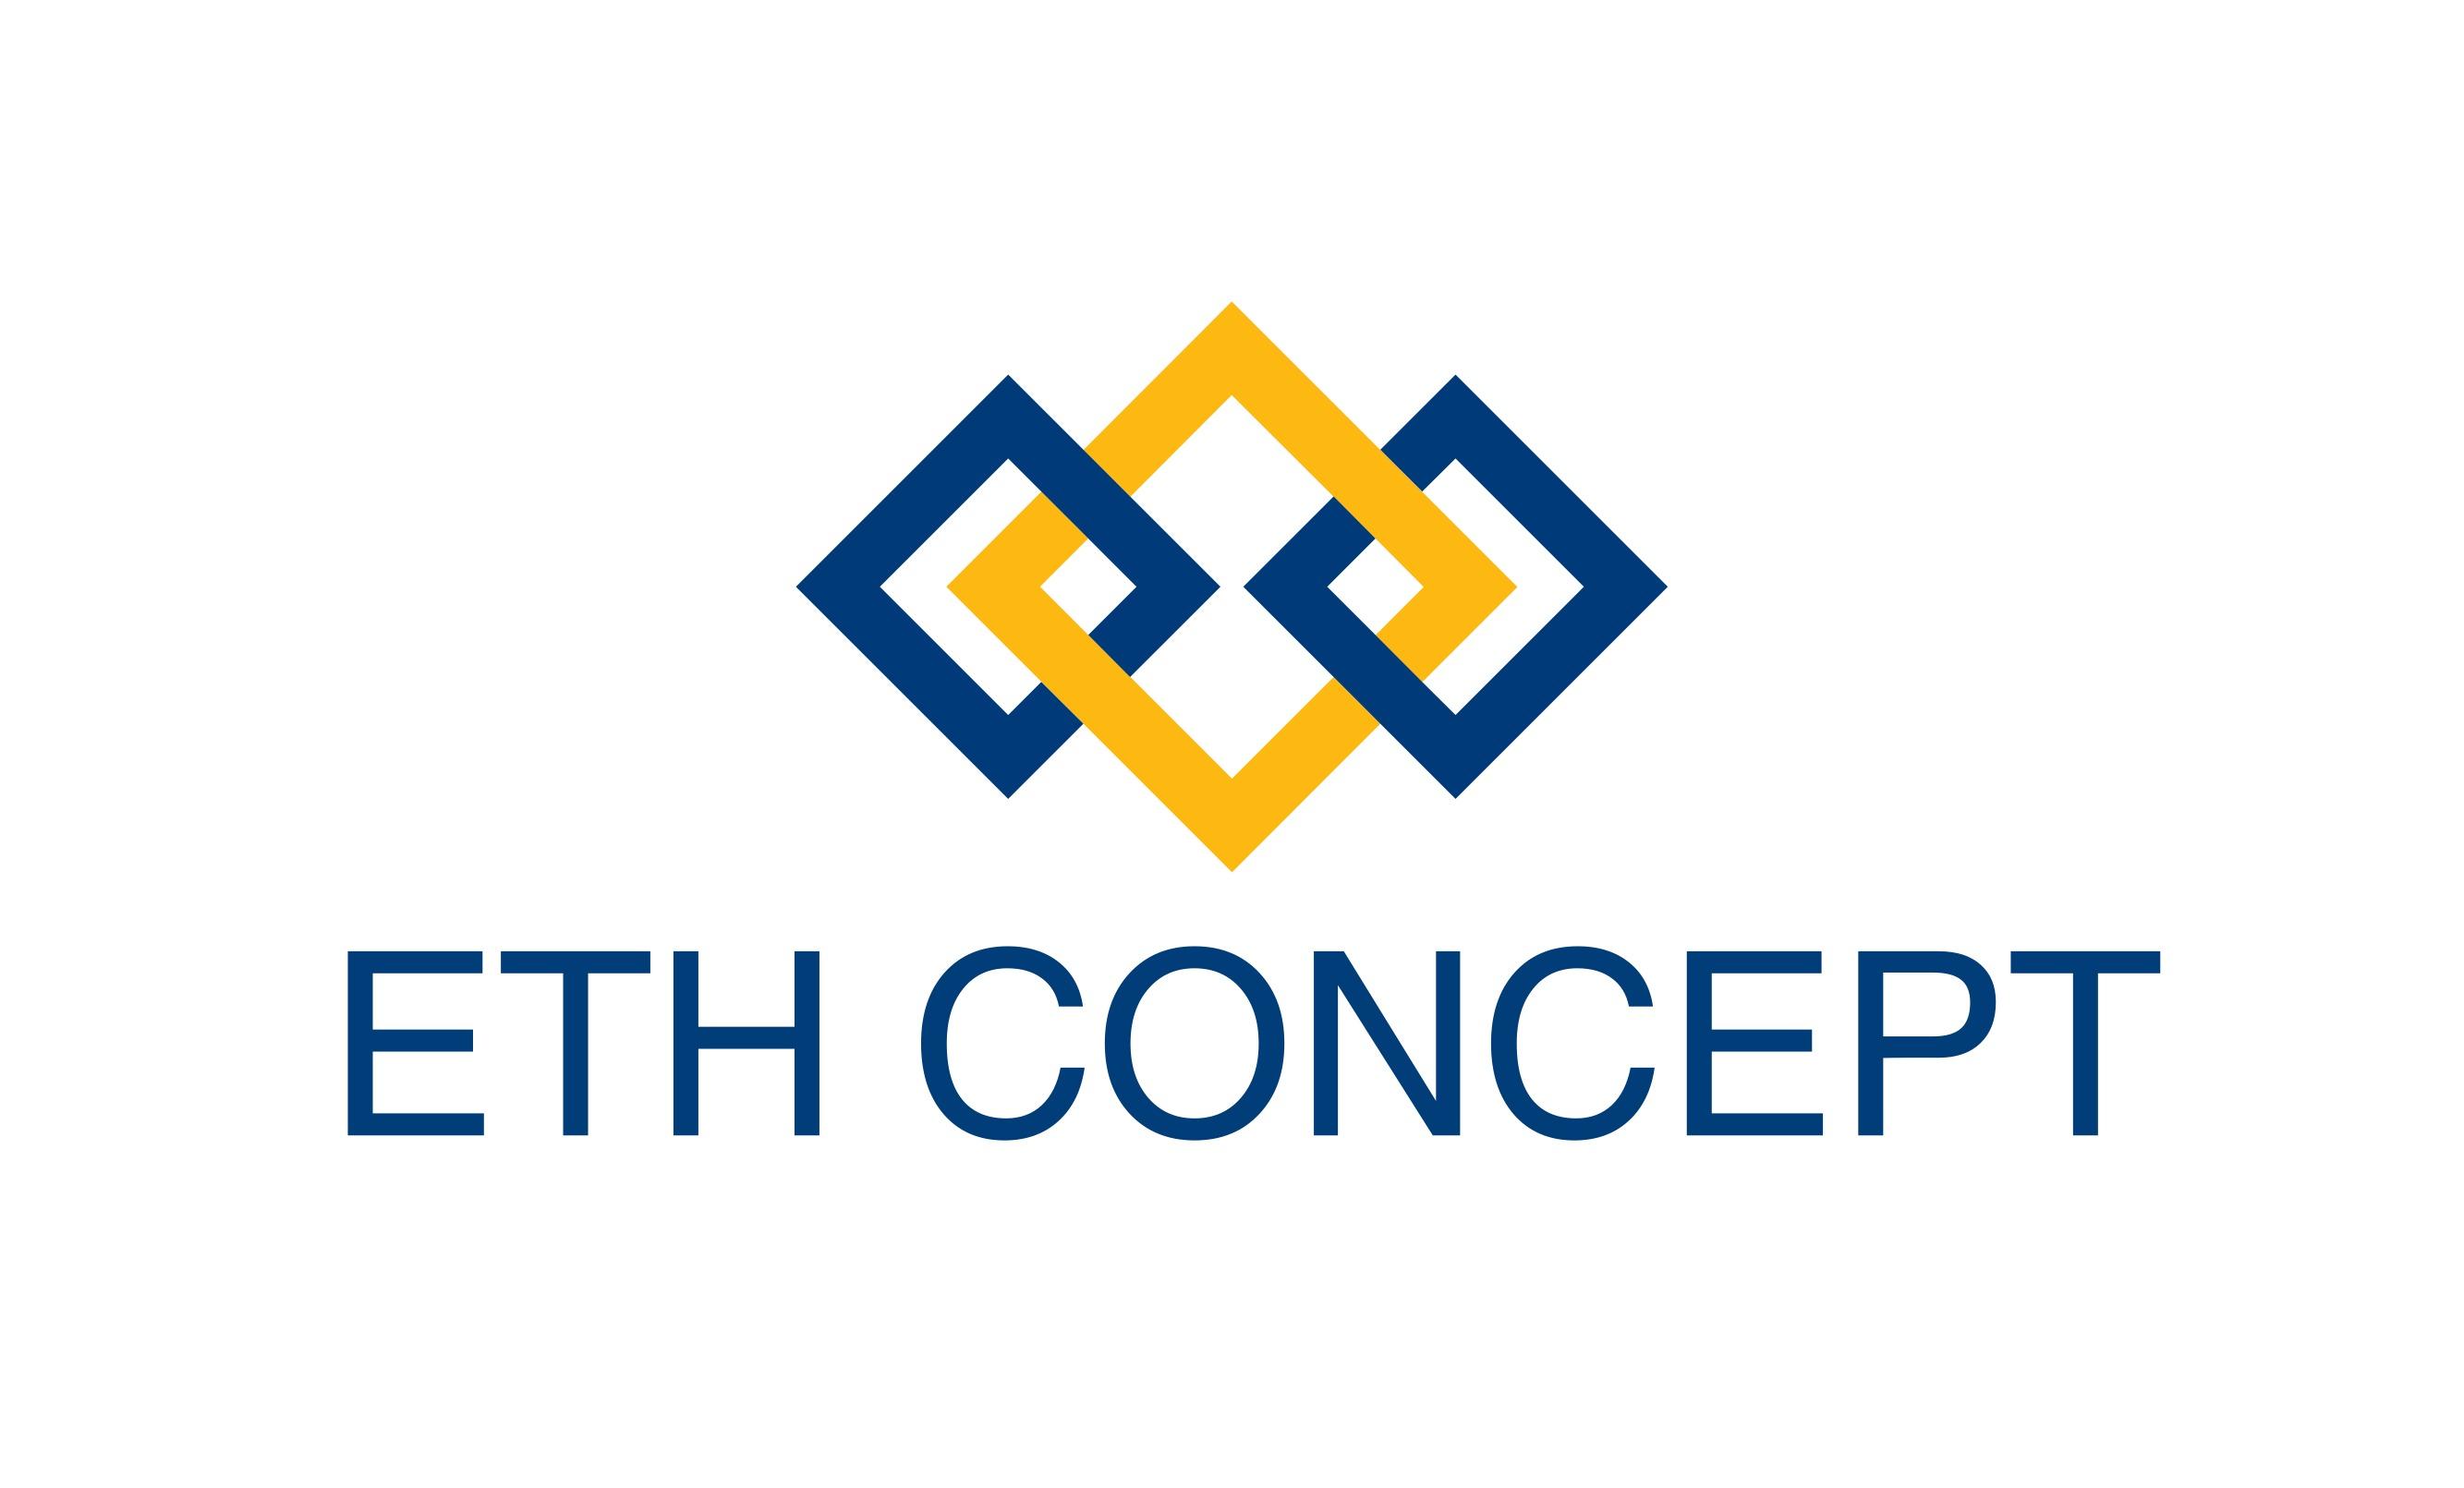 ETH CONCEPT